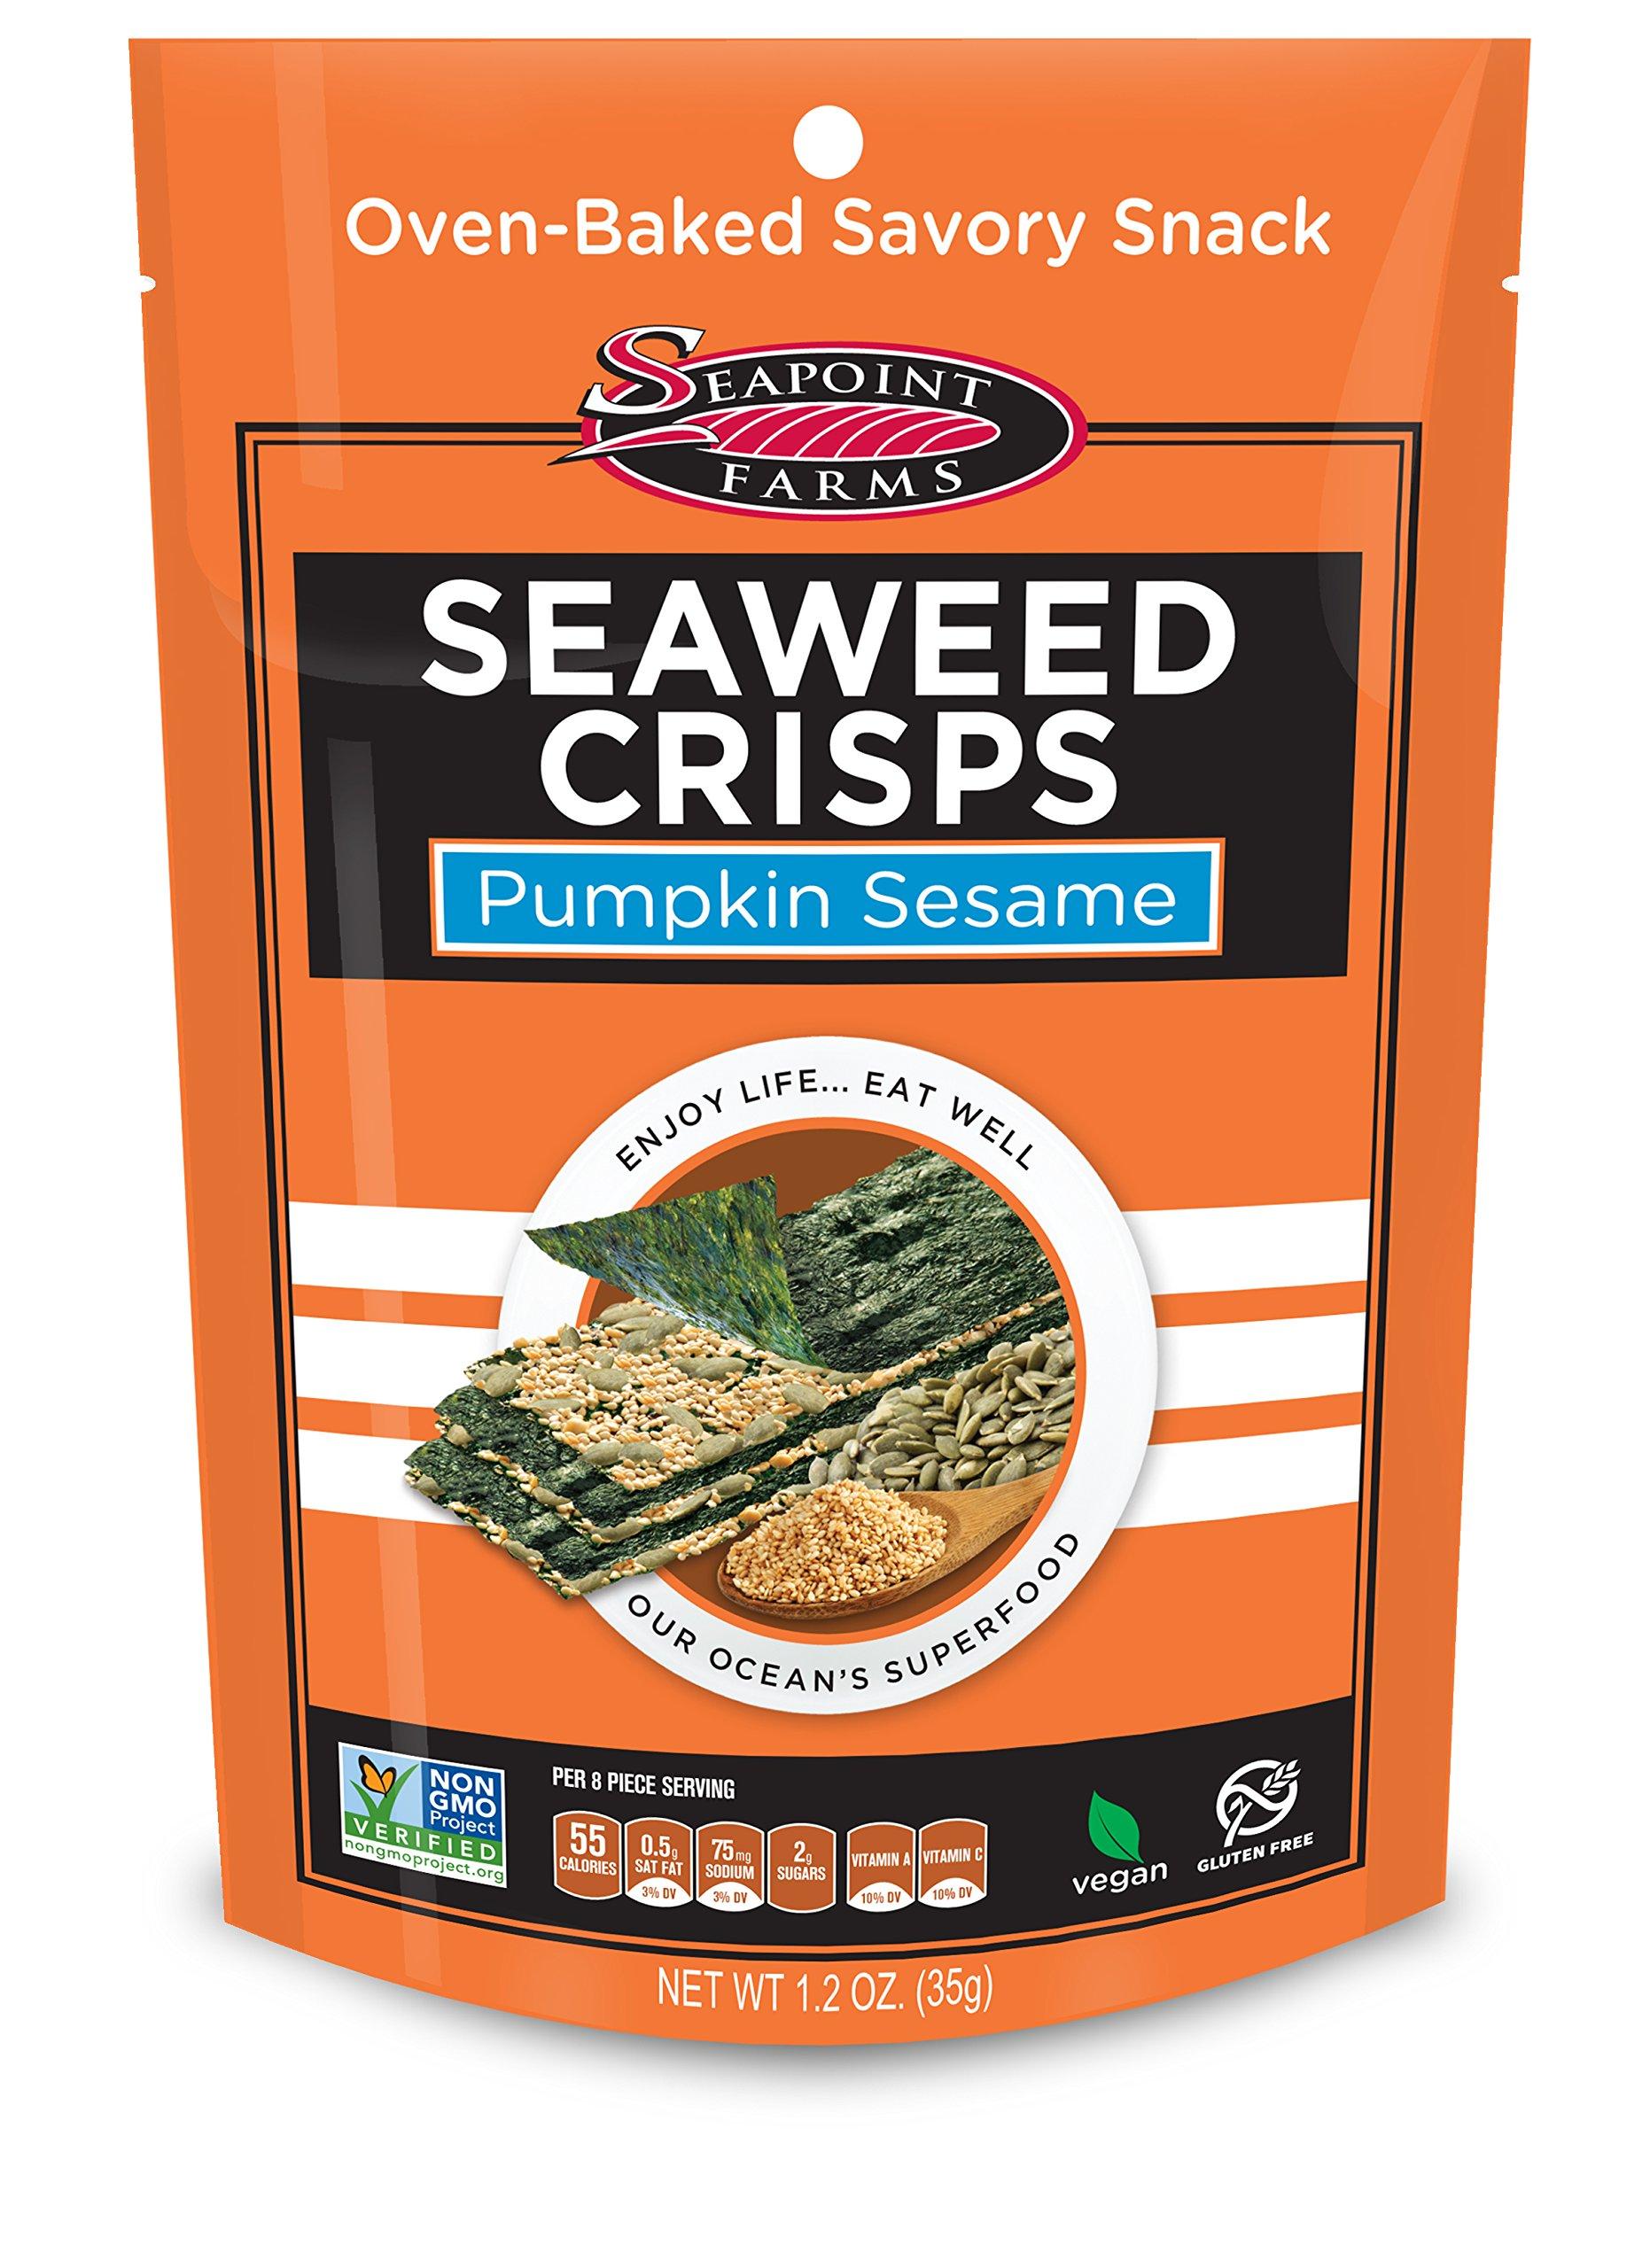 Seapoint Farms Seaweed Crisps, Pumpkin Sesame, 1.2 Ounce (Pack of 12)